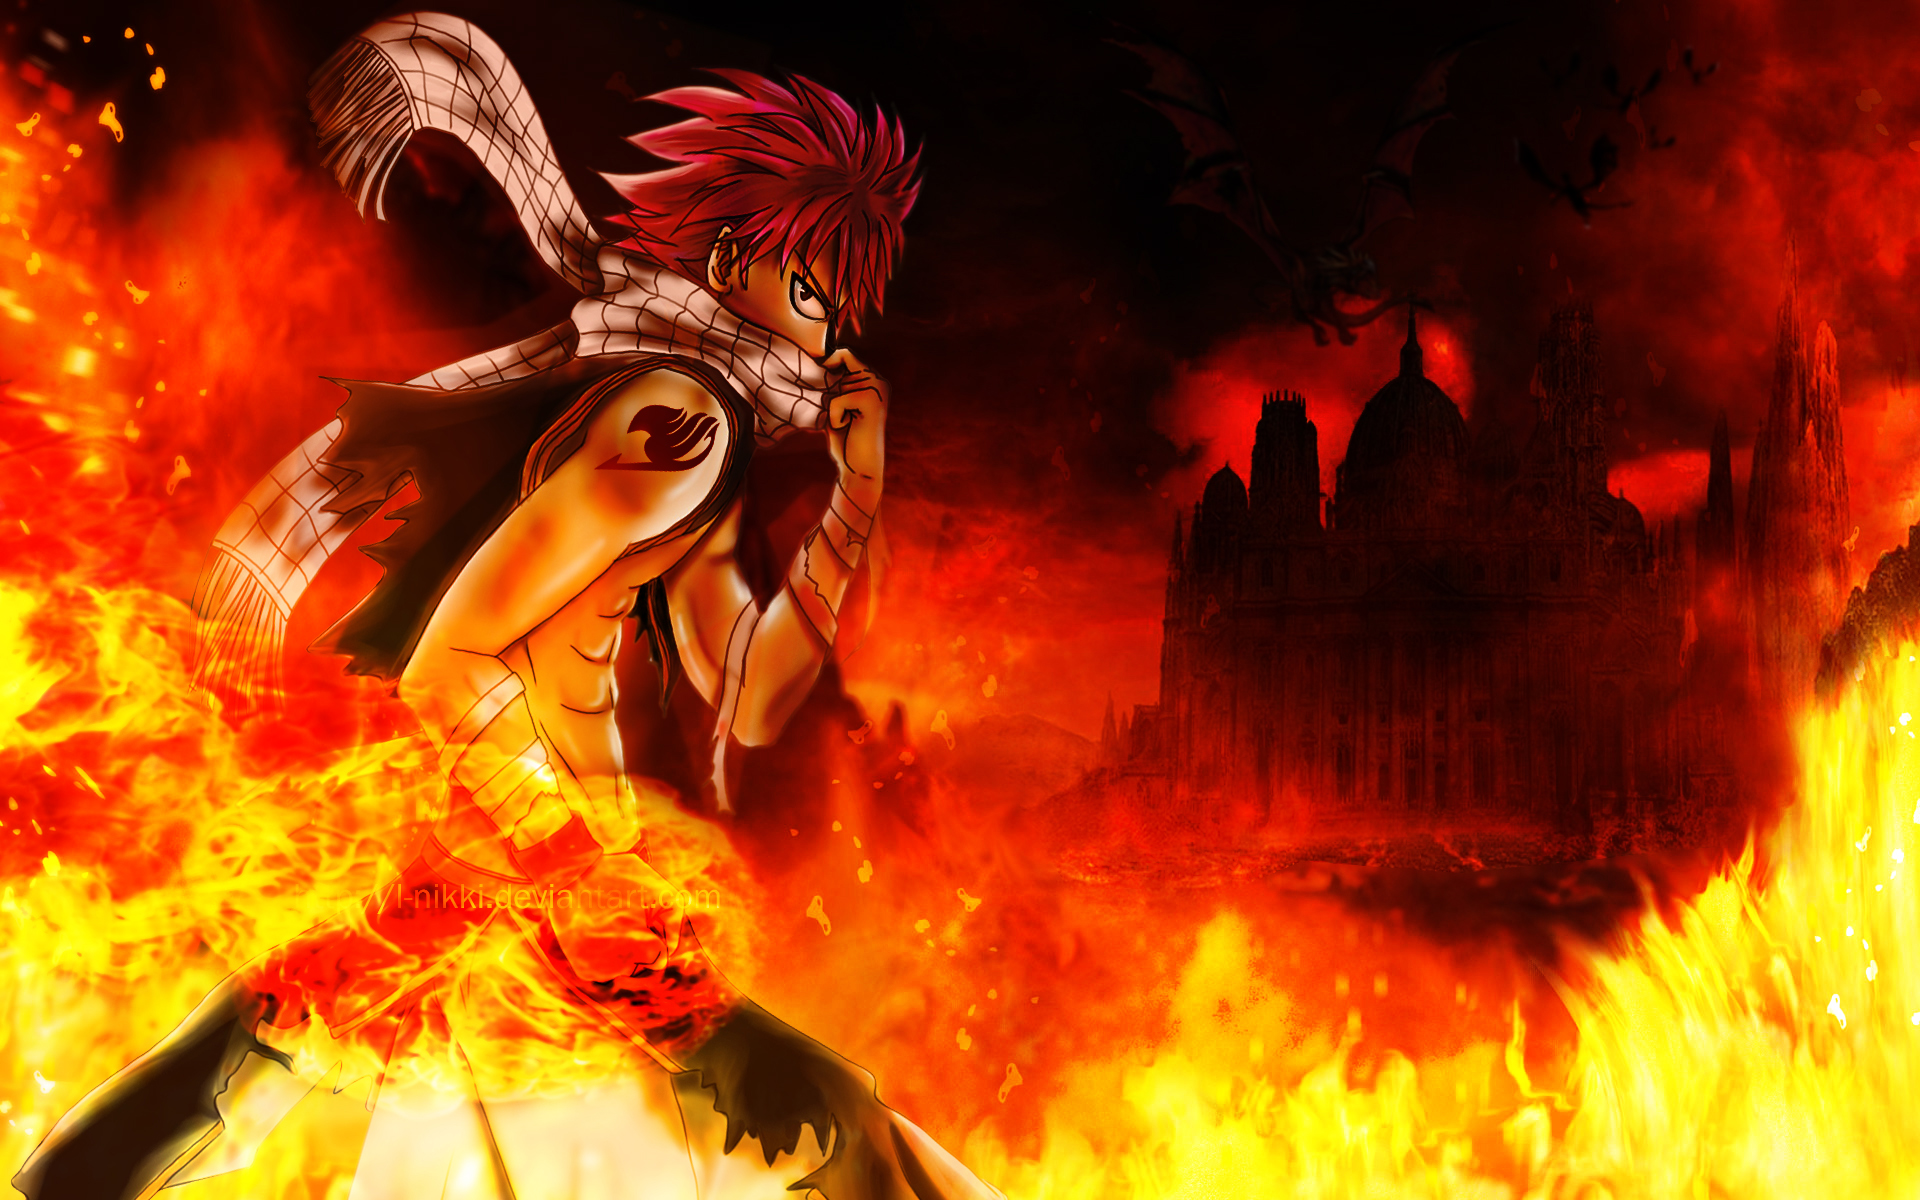 Natsu Dragneel The Fire Dragon Slayer By L Nikki On Deviantart